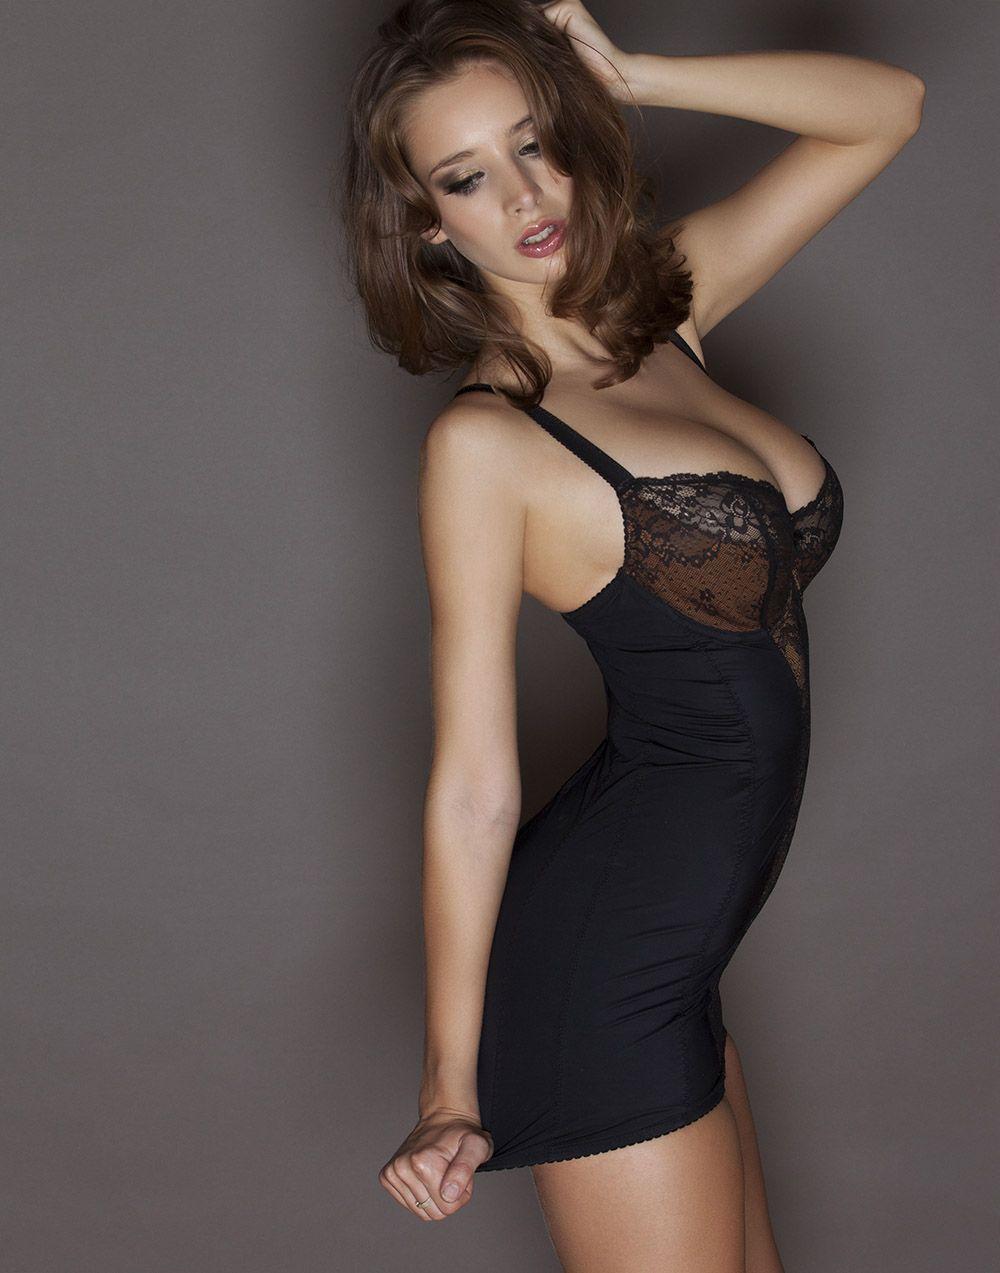 Cleavage Nicole Neal nude (43 photos), Sexy, Hot, Feet, underwear 2020